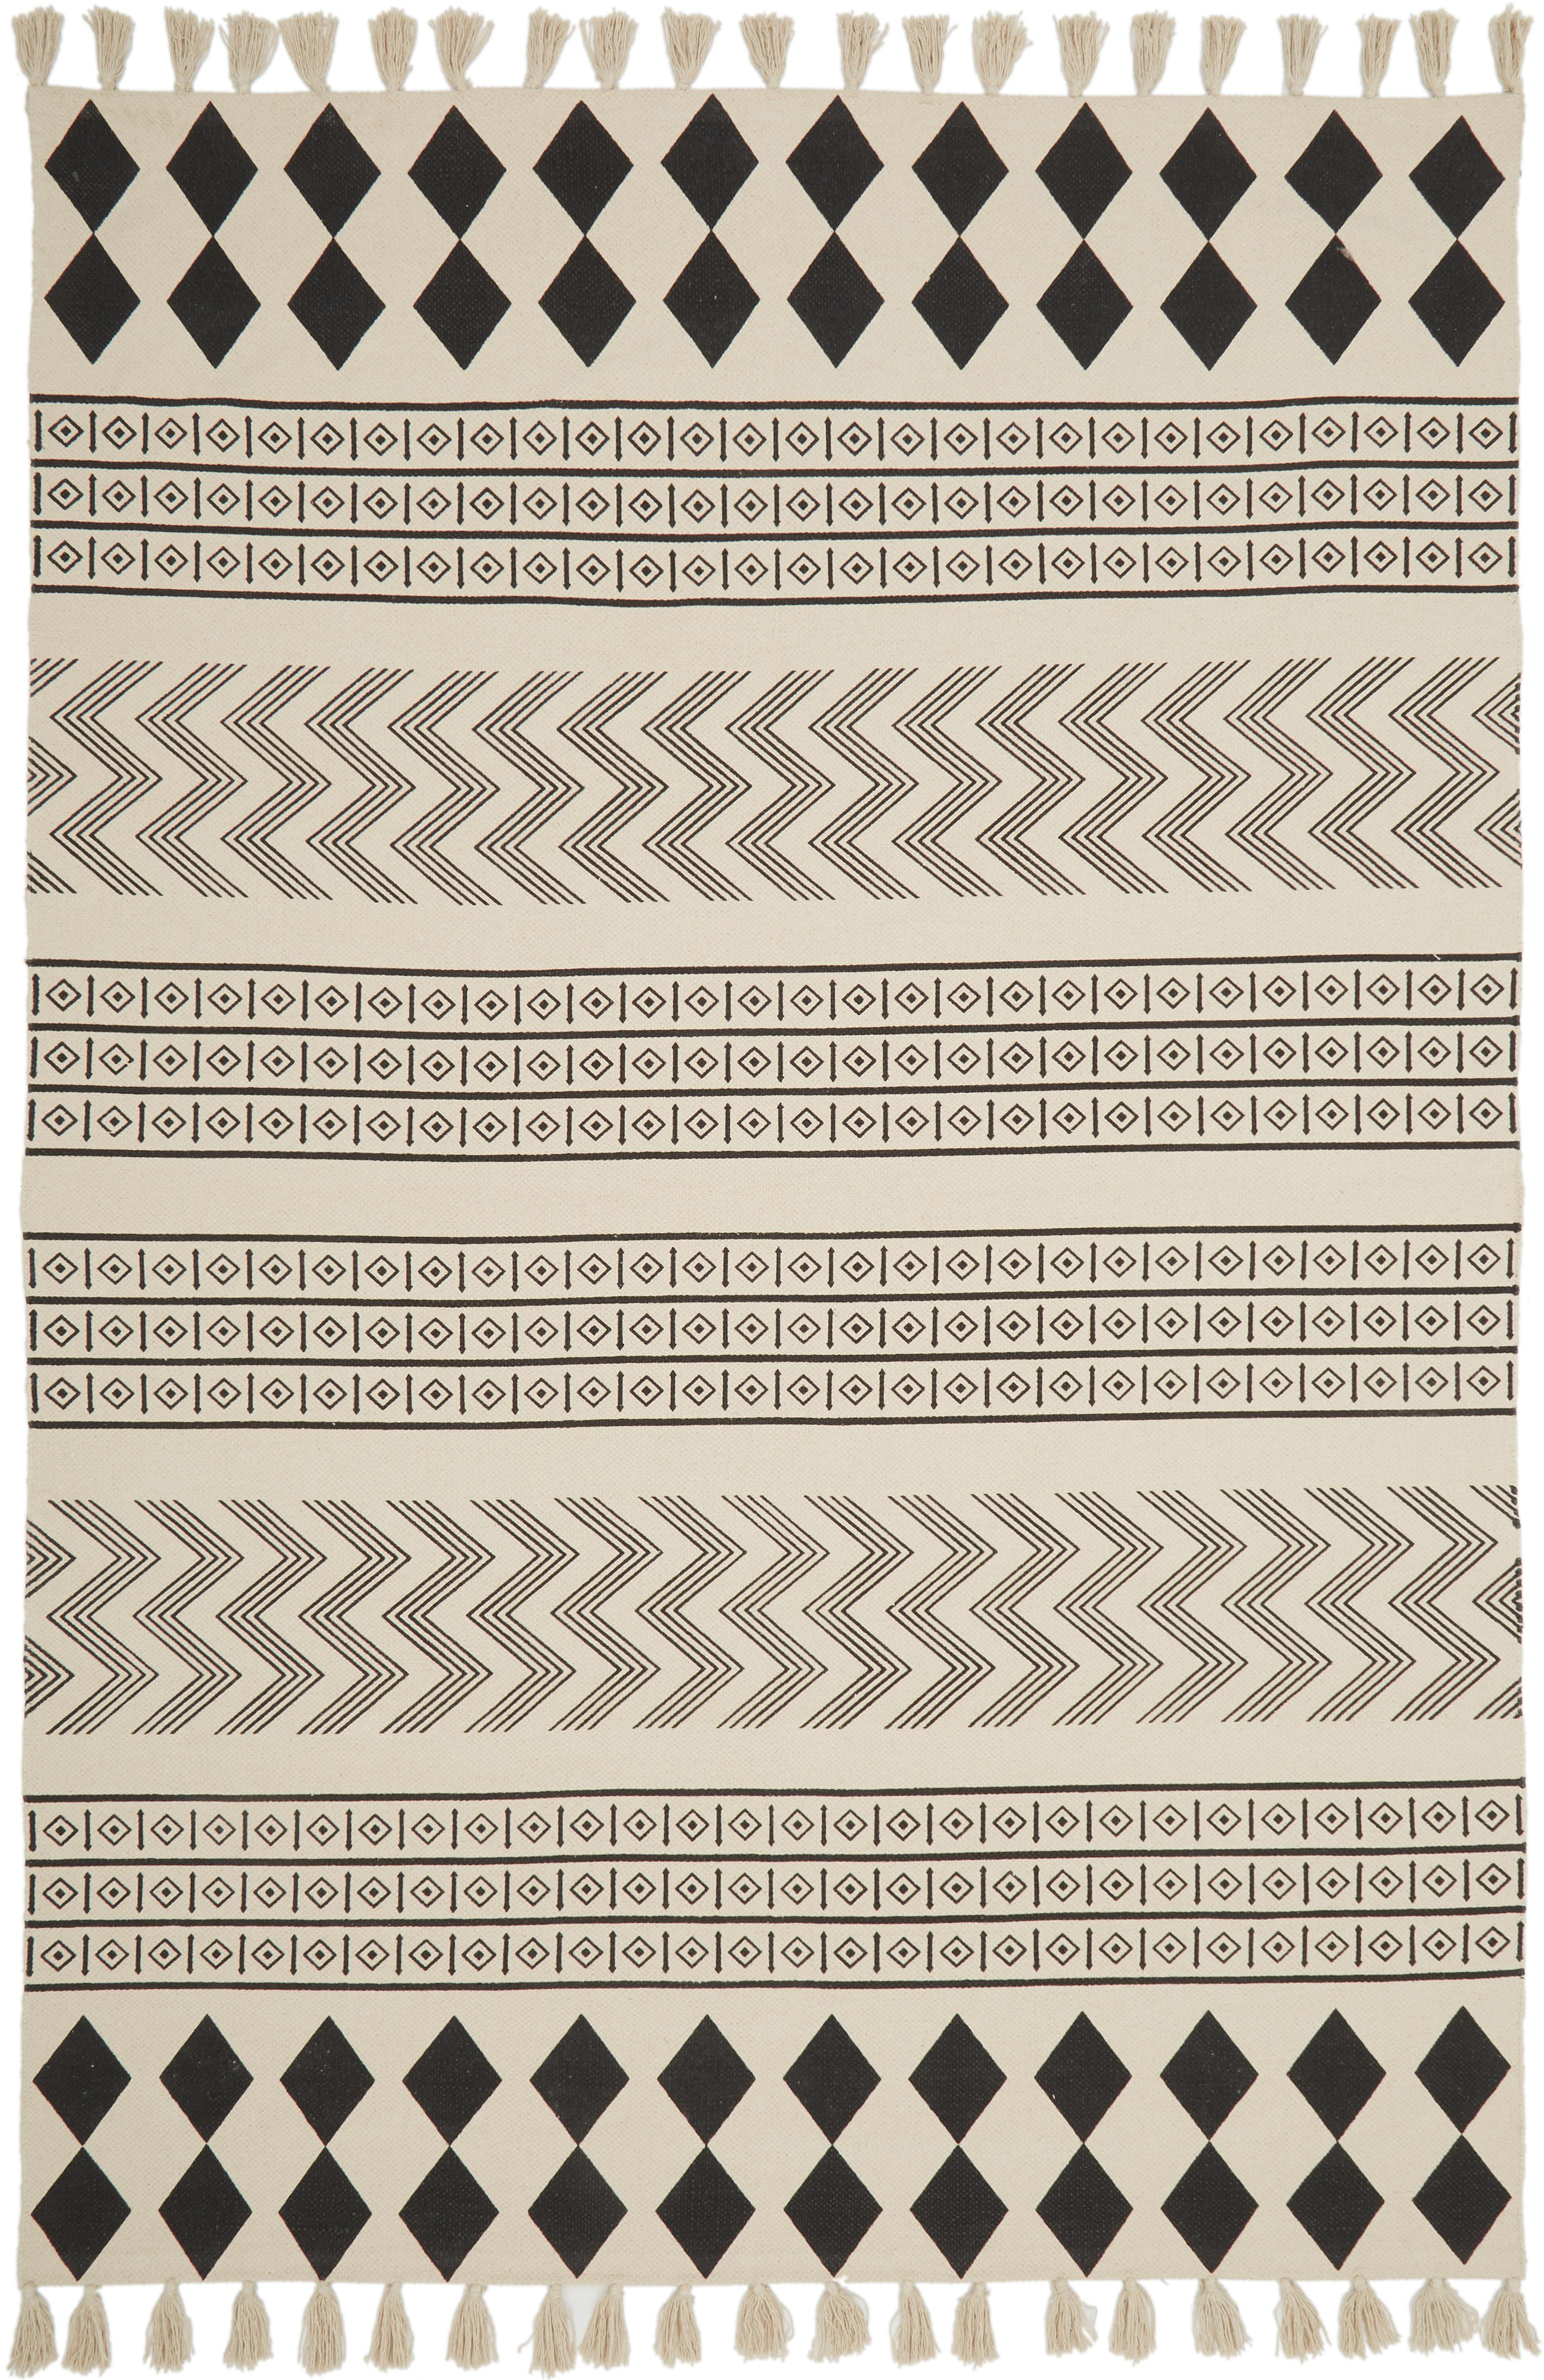 Alfombra artesanal de algodón Edna, estilo étnico, Algodón, Blanco crema, negro, An 60 x L 90 cm (Tamaño XS)